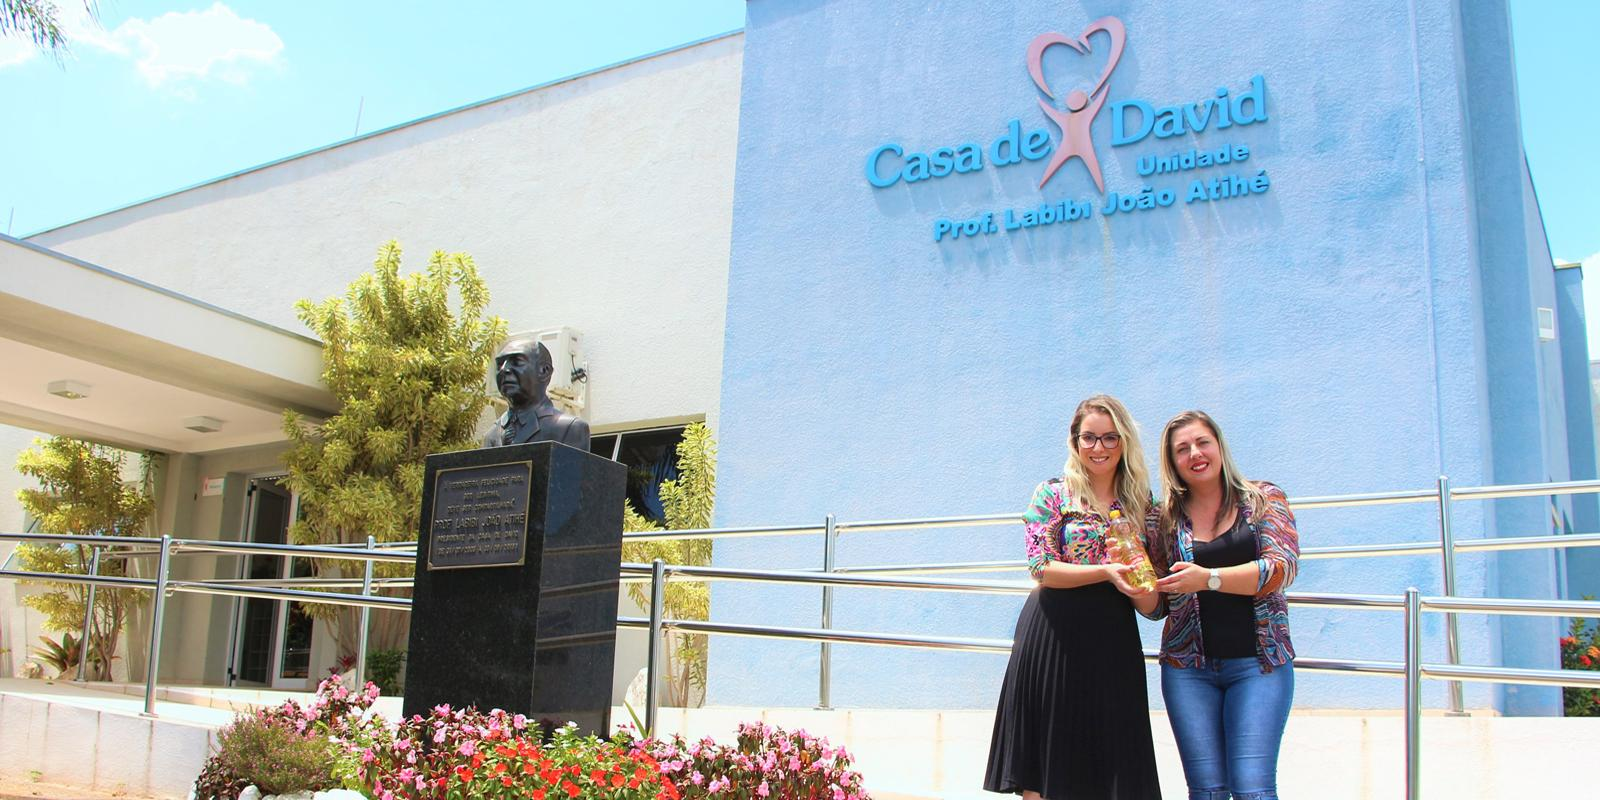 UNIFAAT realiza entrega de donativos para a Casa de David